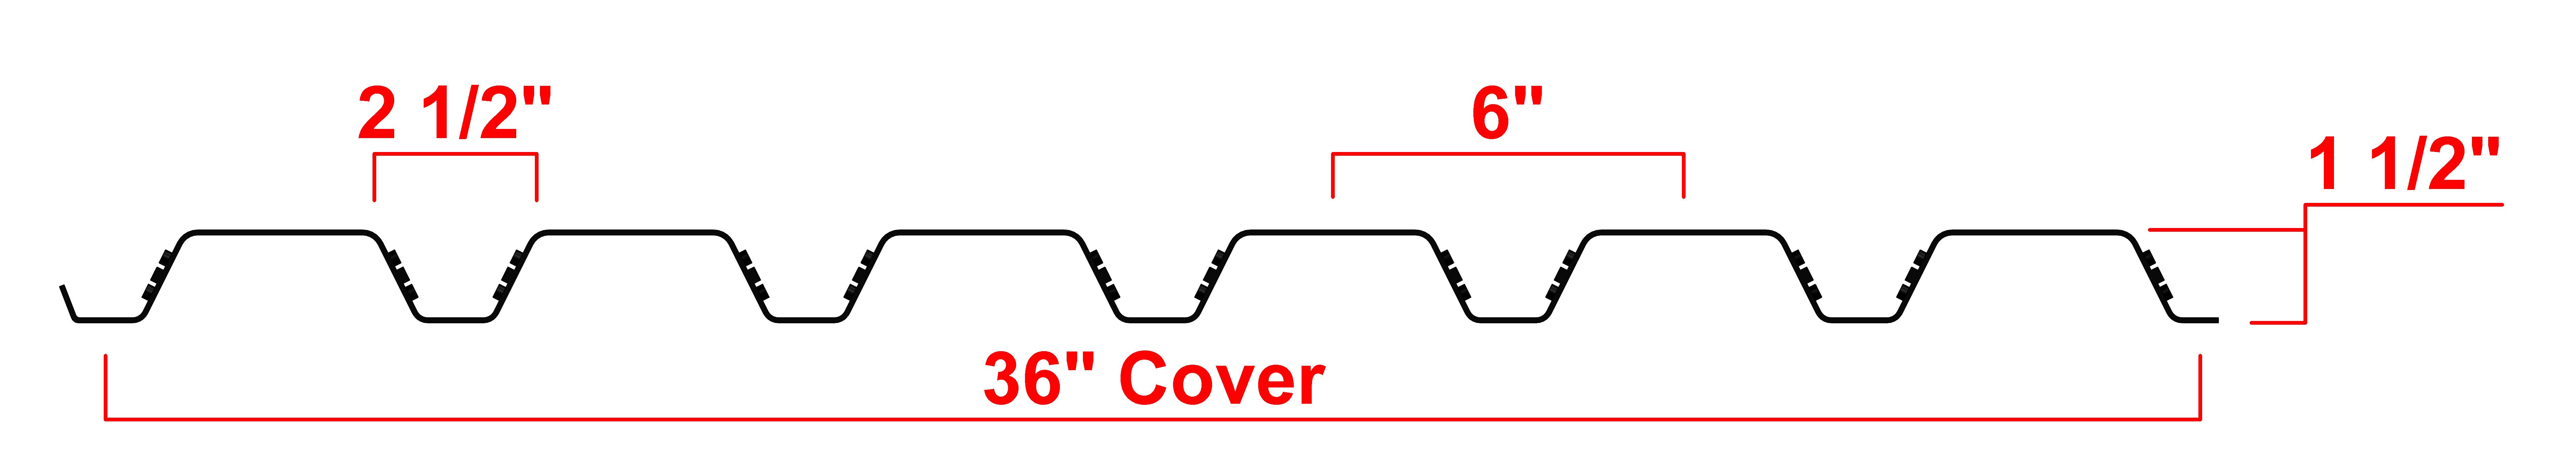 1.5 or 1.5VLI Composite Deck Profile